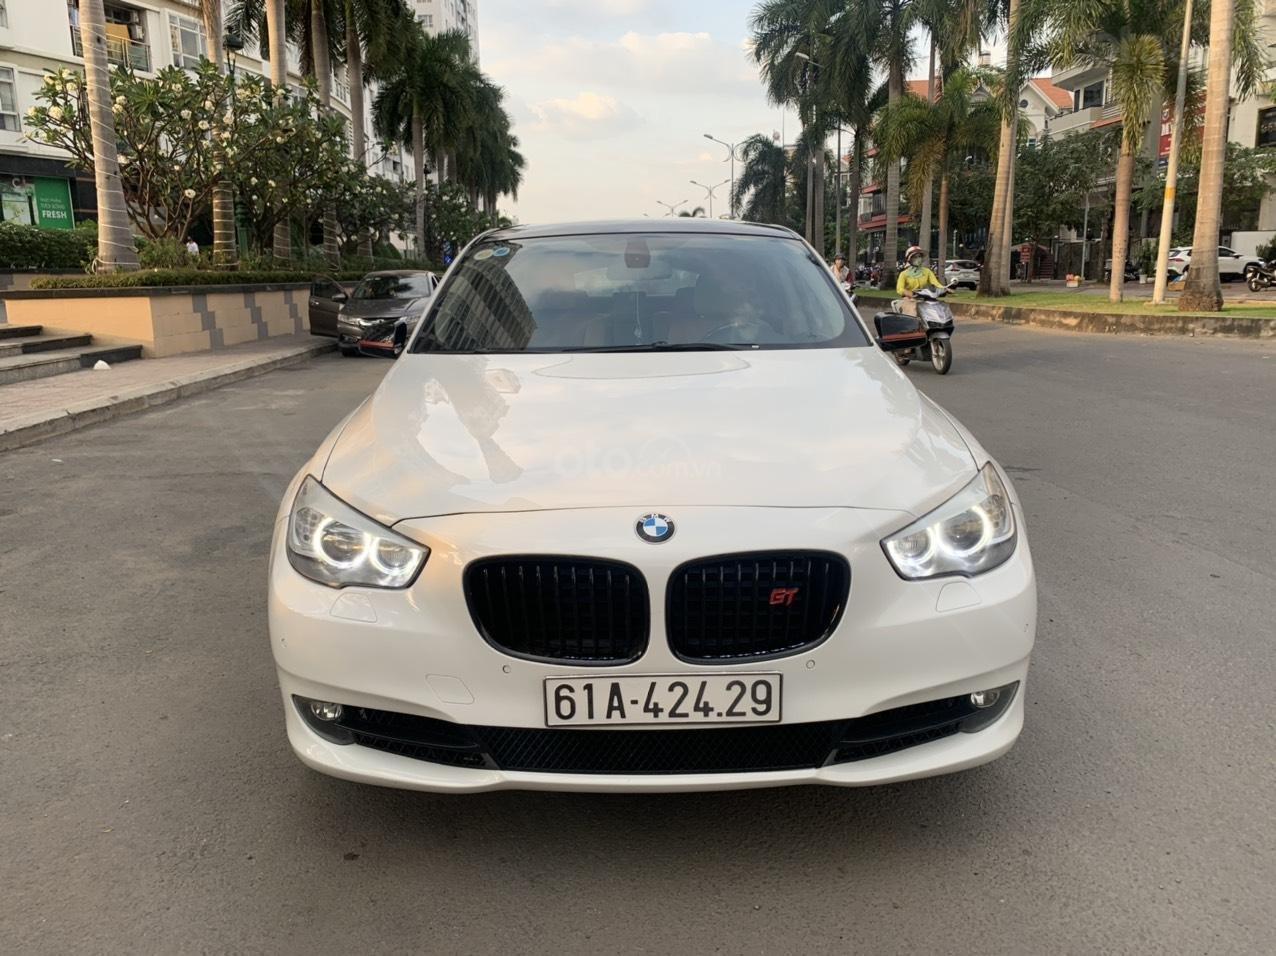 Cần bán gấp BMW 535GT SX 2011, giá 960 triệu (2)